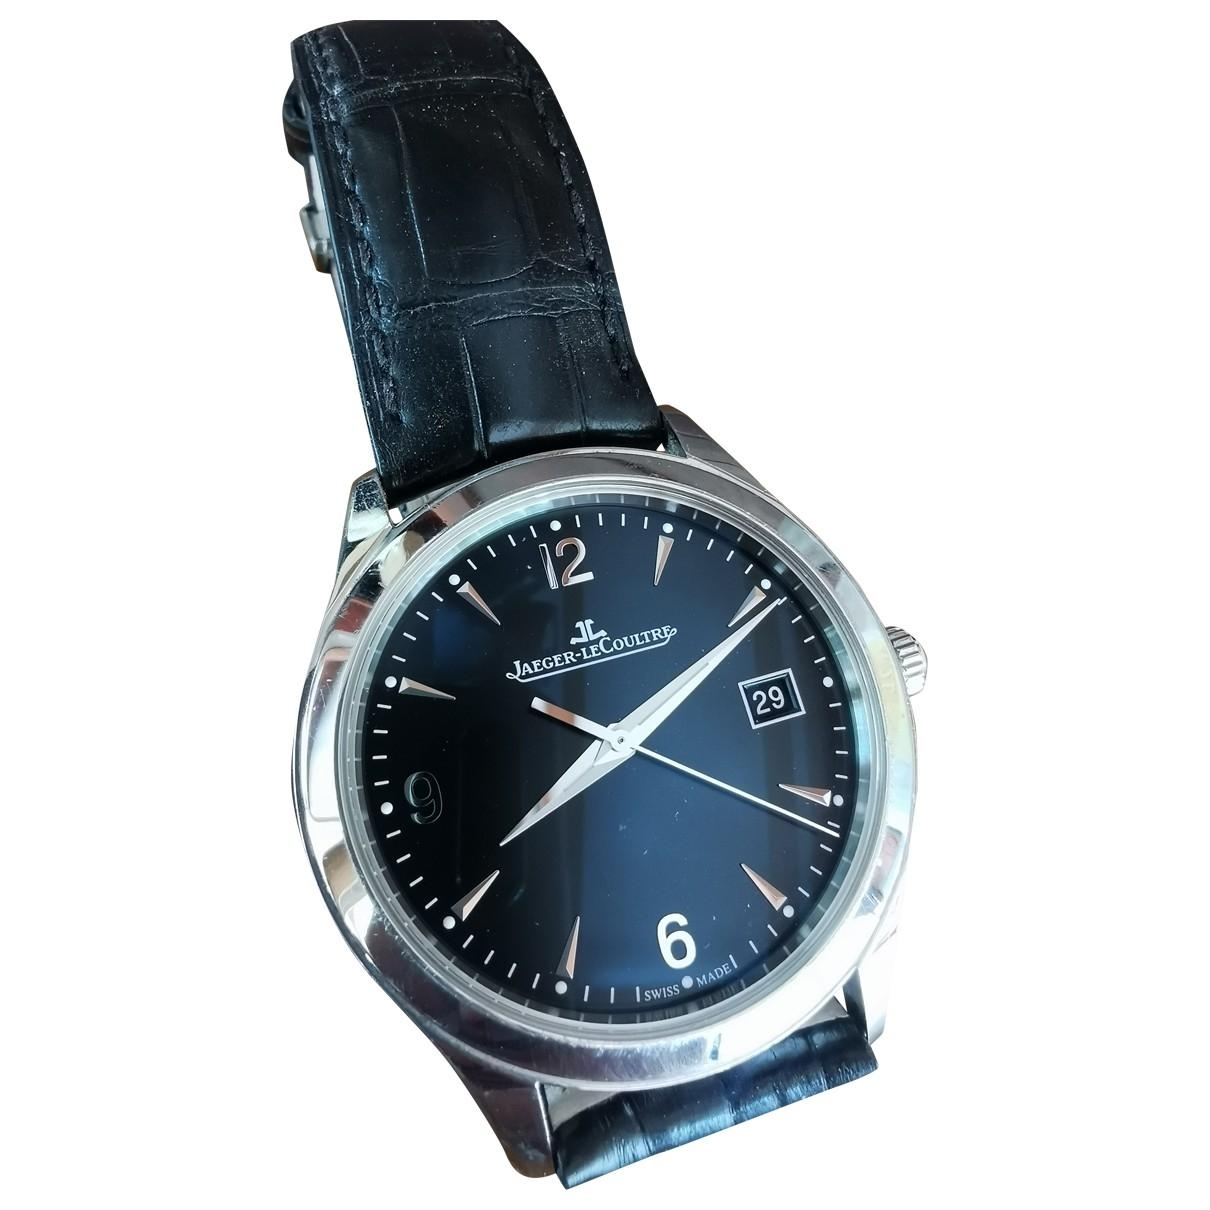 Jaeger-lecoultre Master Control  Uhr in  Anthrazit Stahl